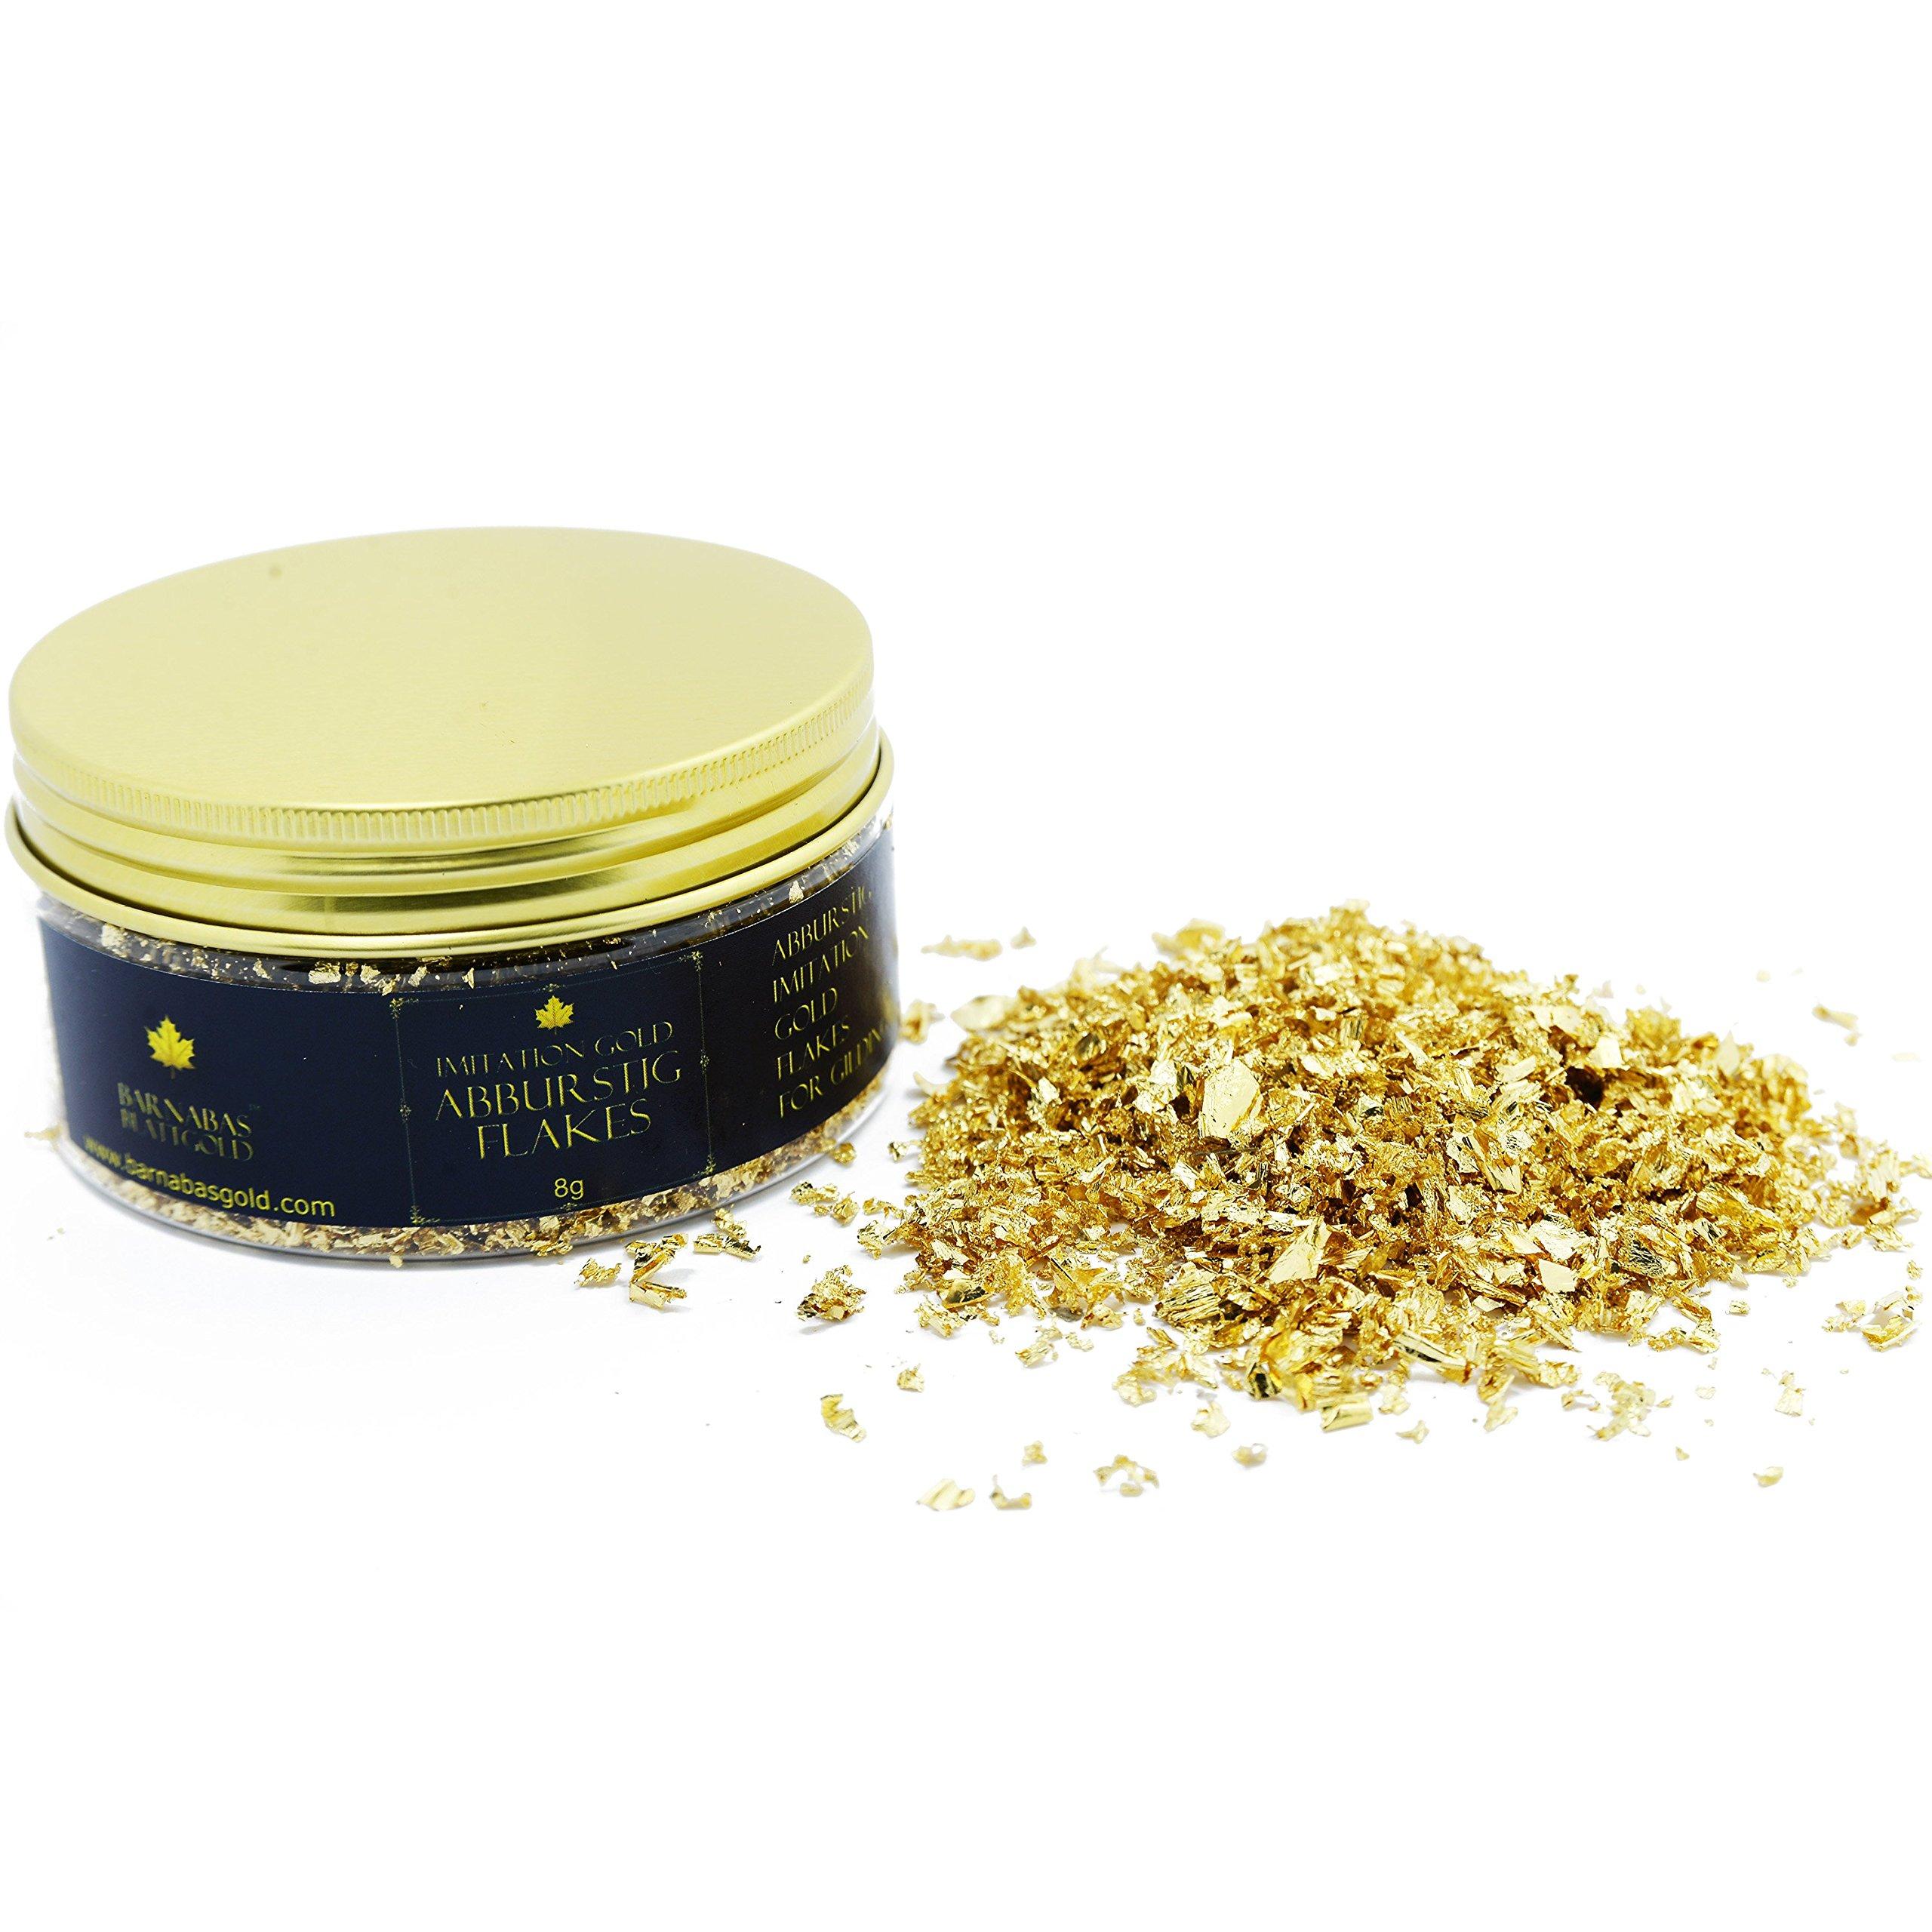 Imitation Gold Leaf Abburstig Flakes Metallic Foil Flakes for Gilding, Painting Arts and Crafts (10oz jar)